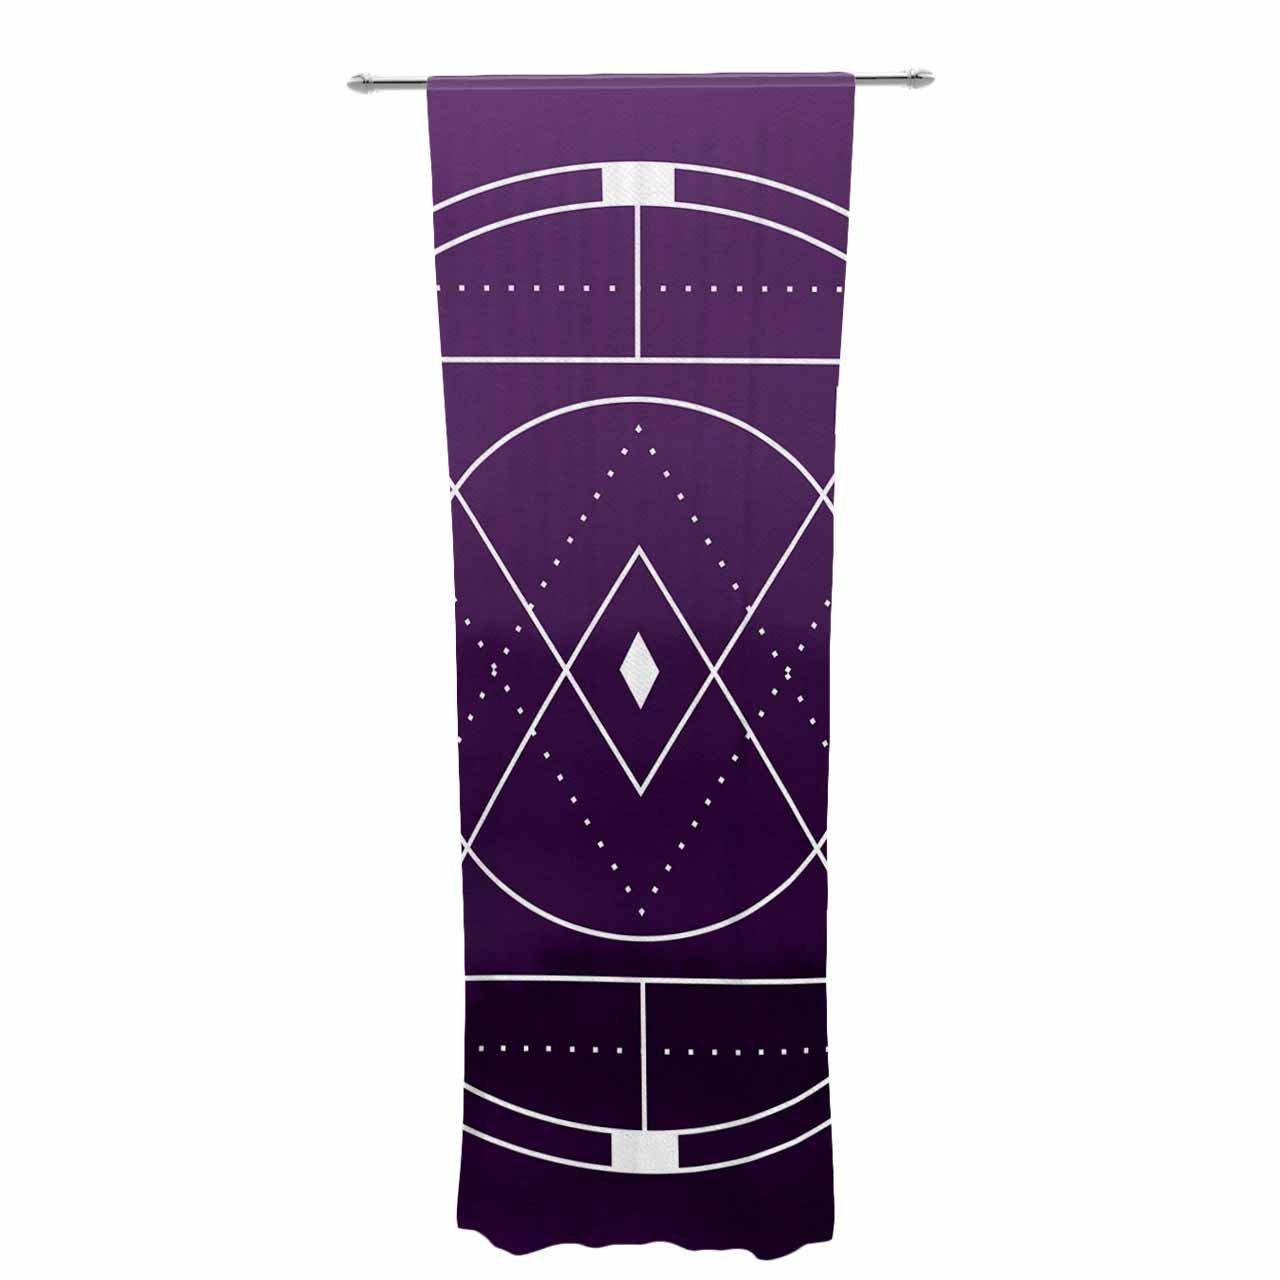 Kess InHouse Matt Eklund Mystic City Sheer Curtains 30 x 84